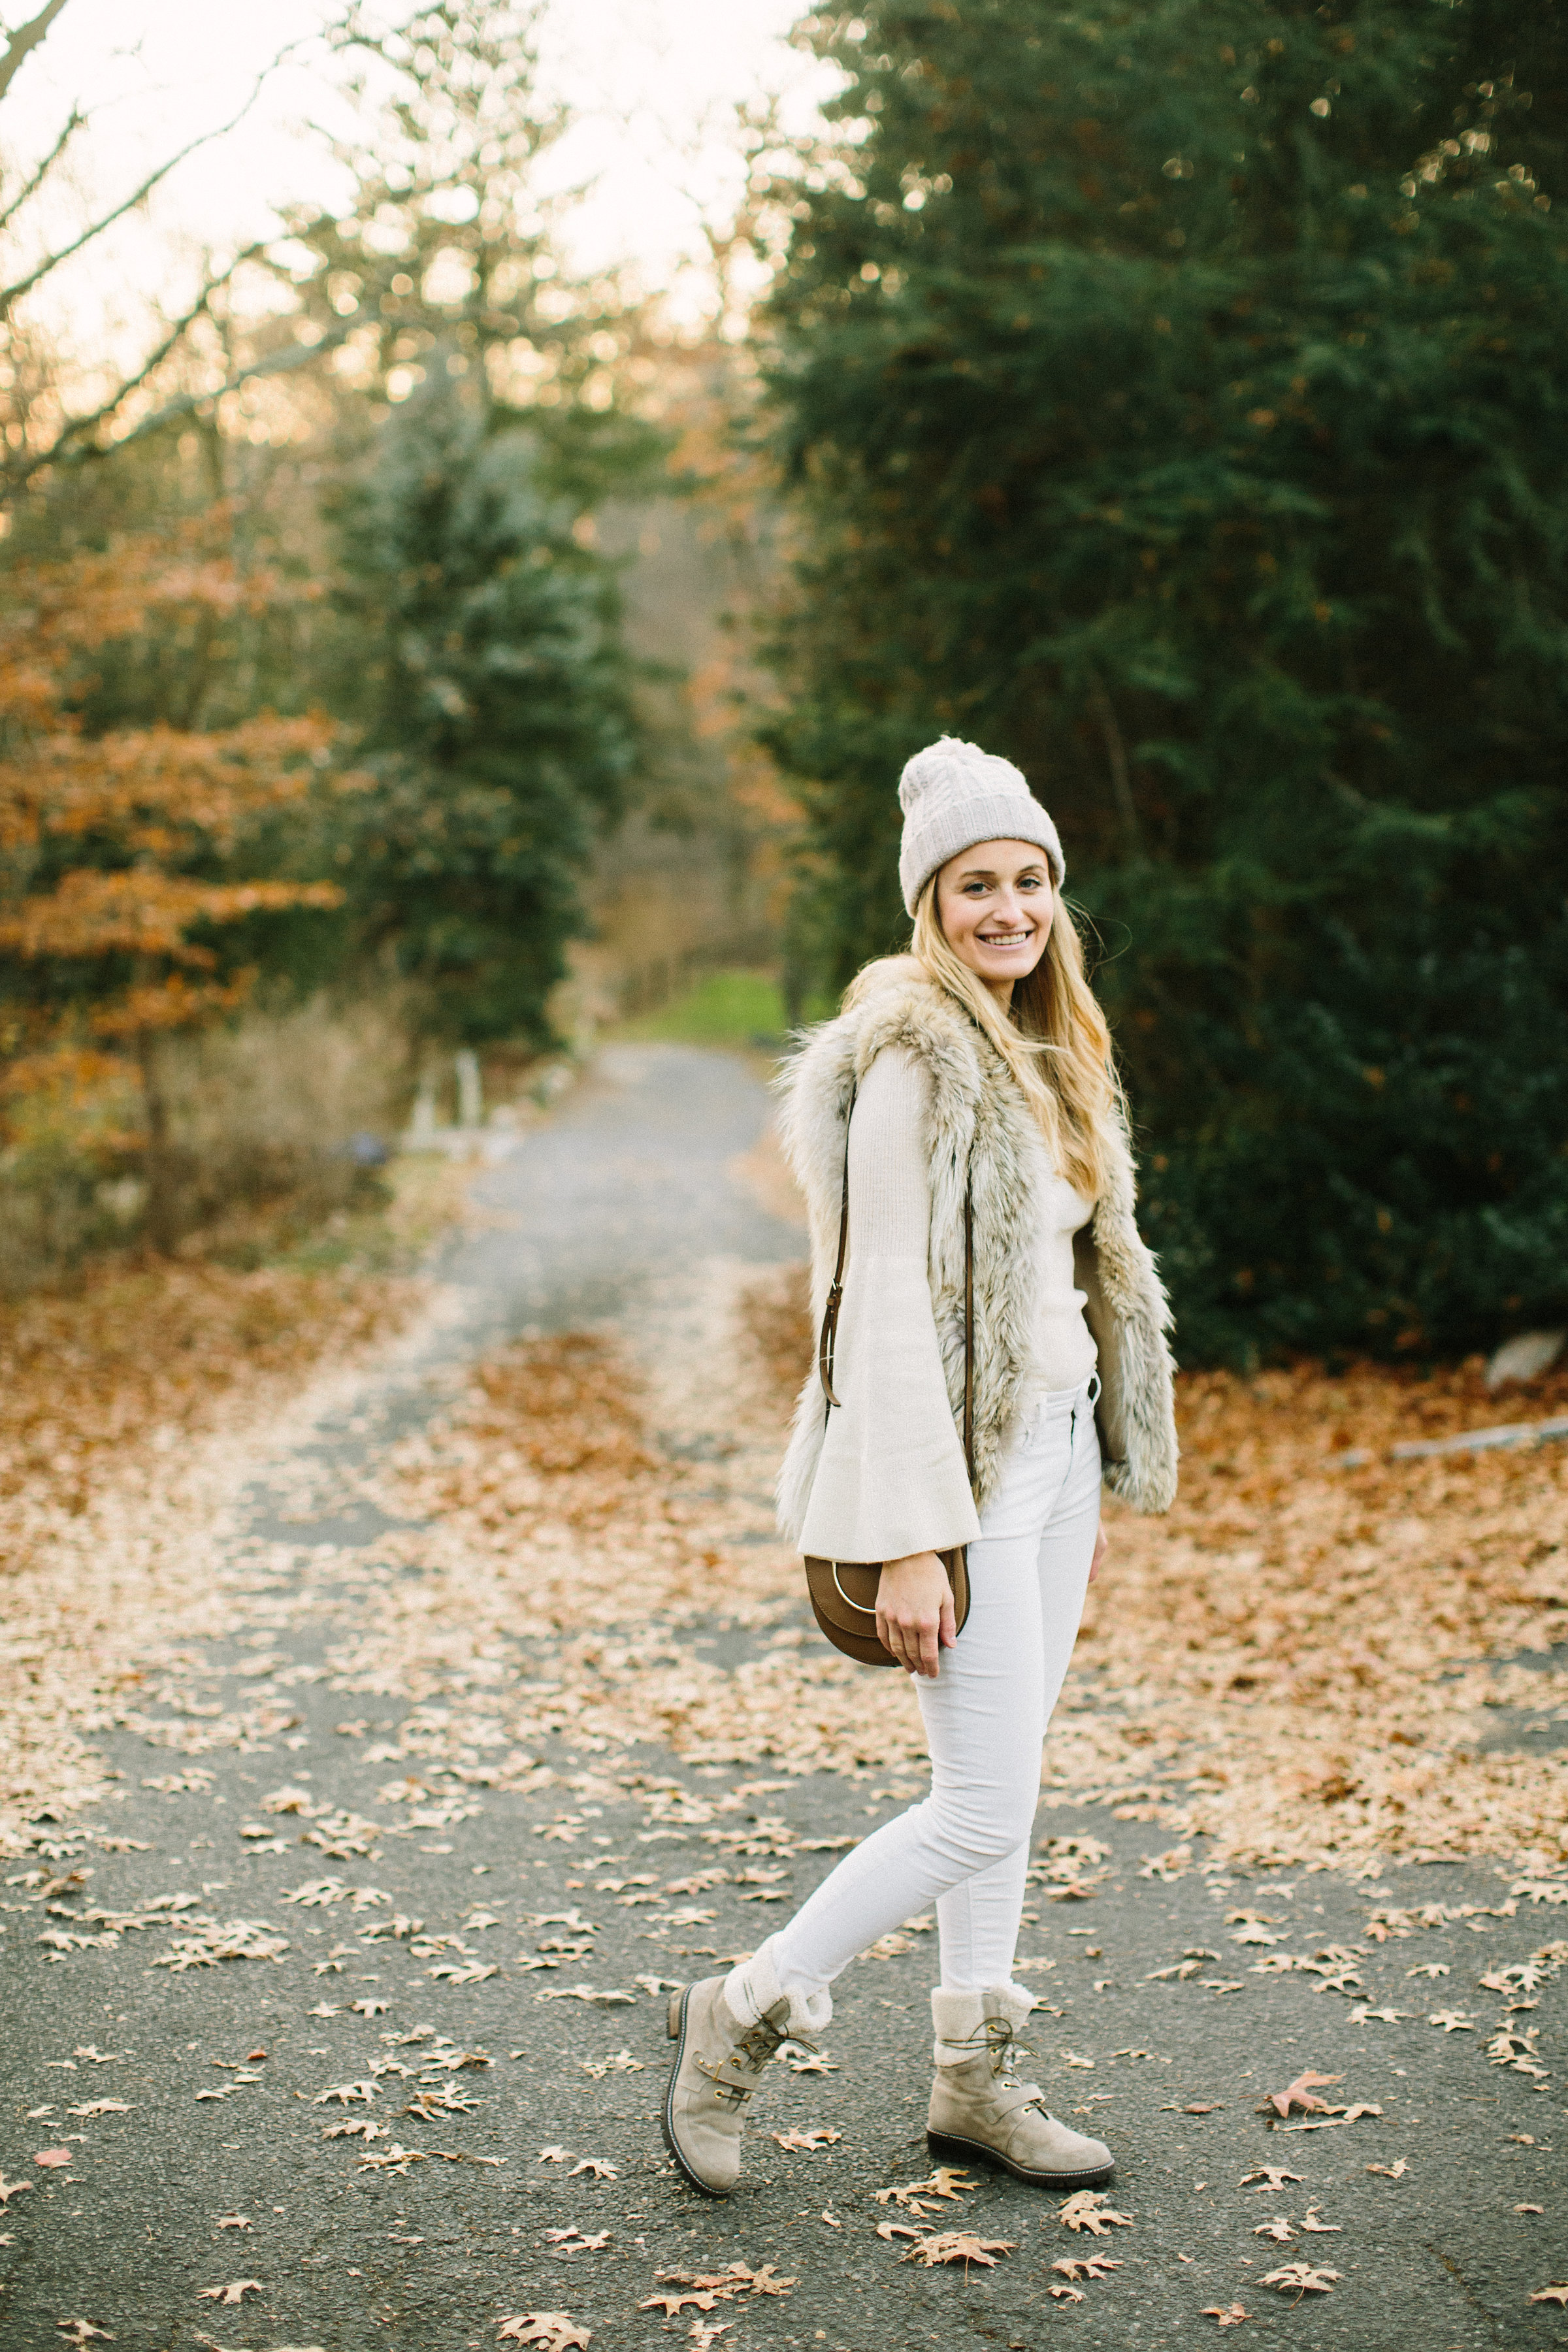 TheGirlGuide-StephanieTrotta-LindsayMaddenPhotography-22.jpg